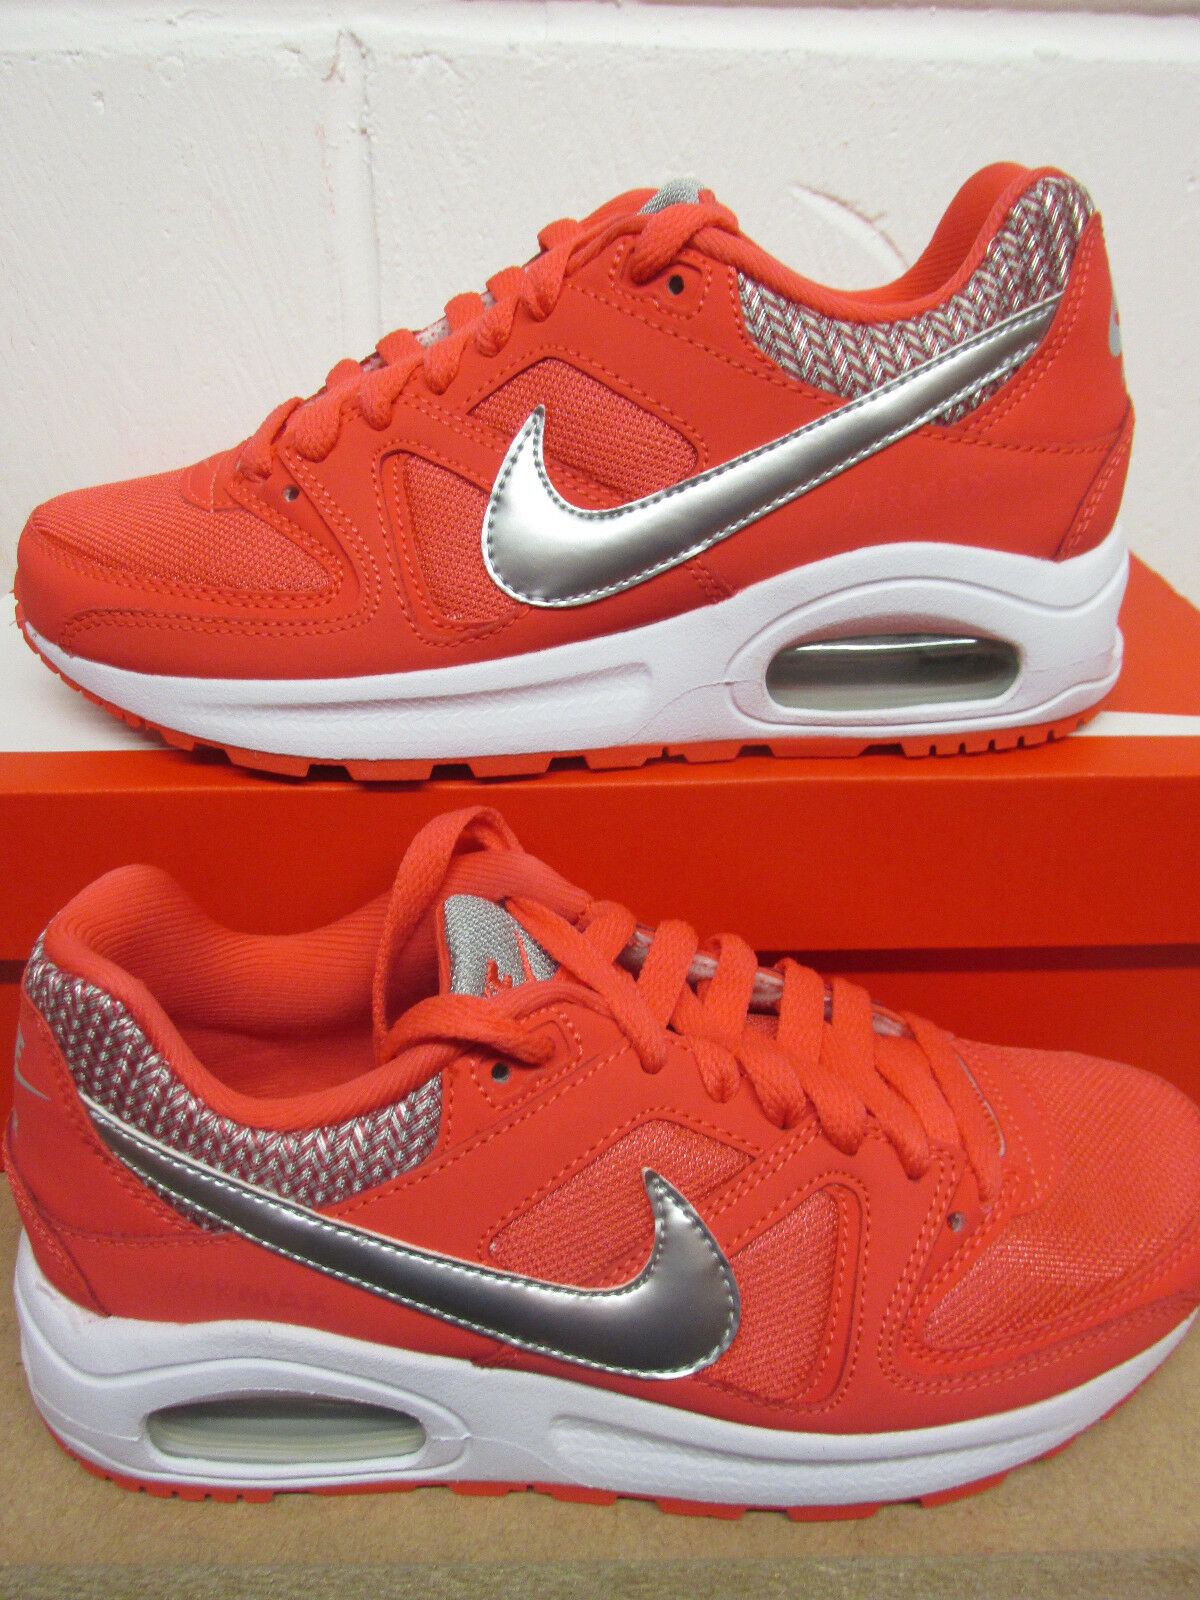 Nike air max - flex (gs) trainer schuhe 844349 801 Turnschuhe, schuhe trainer 377f0d